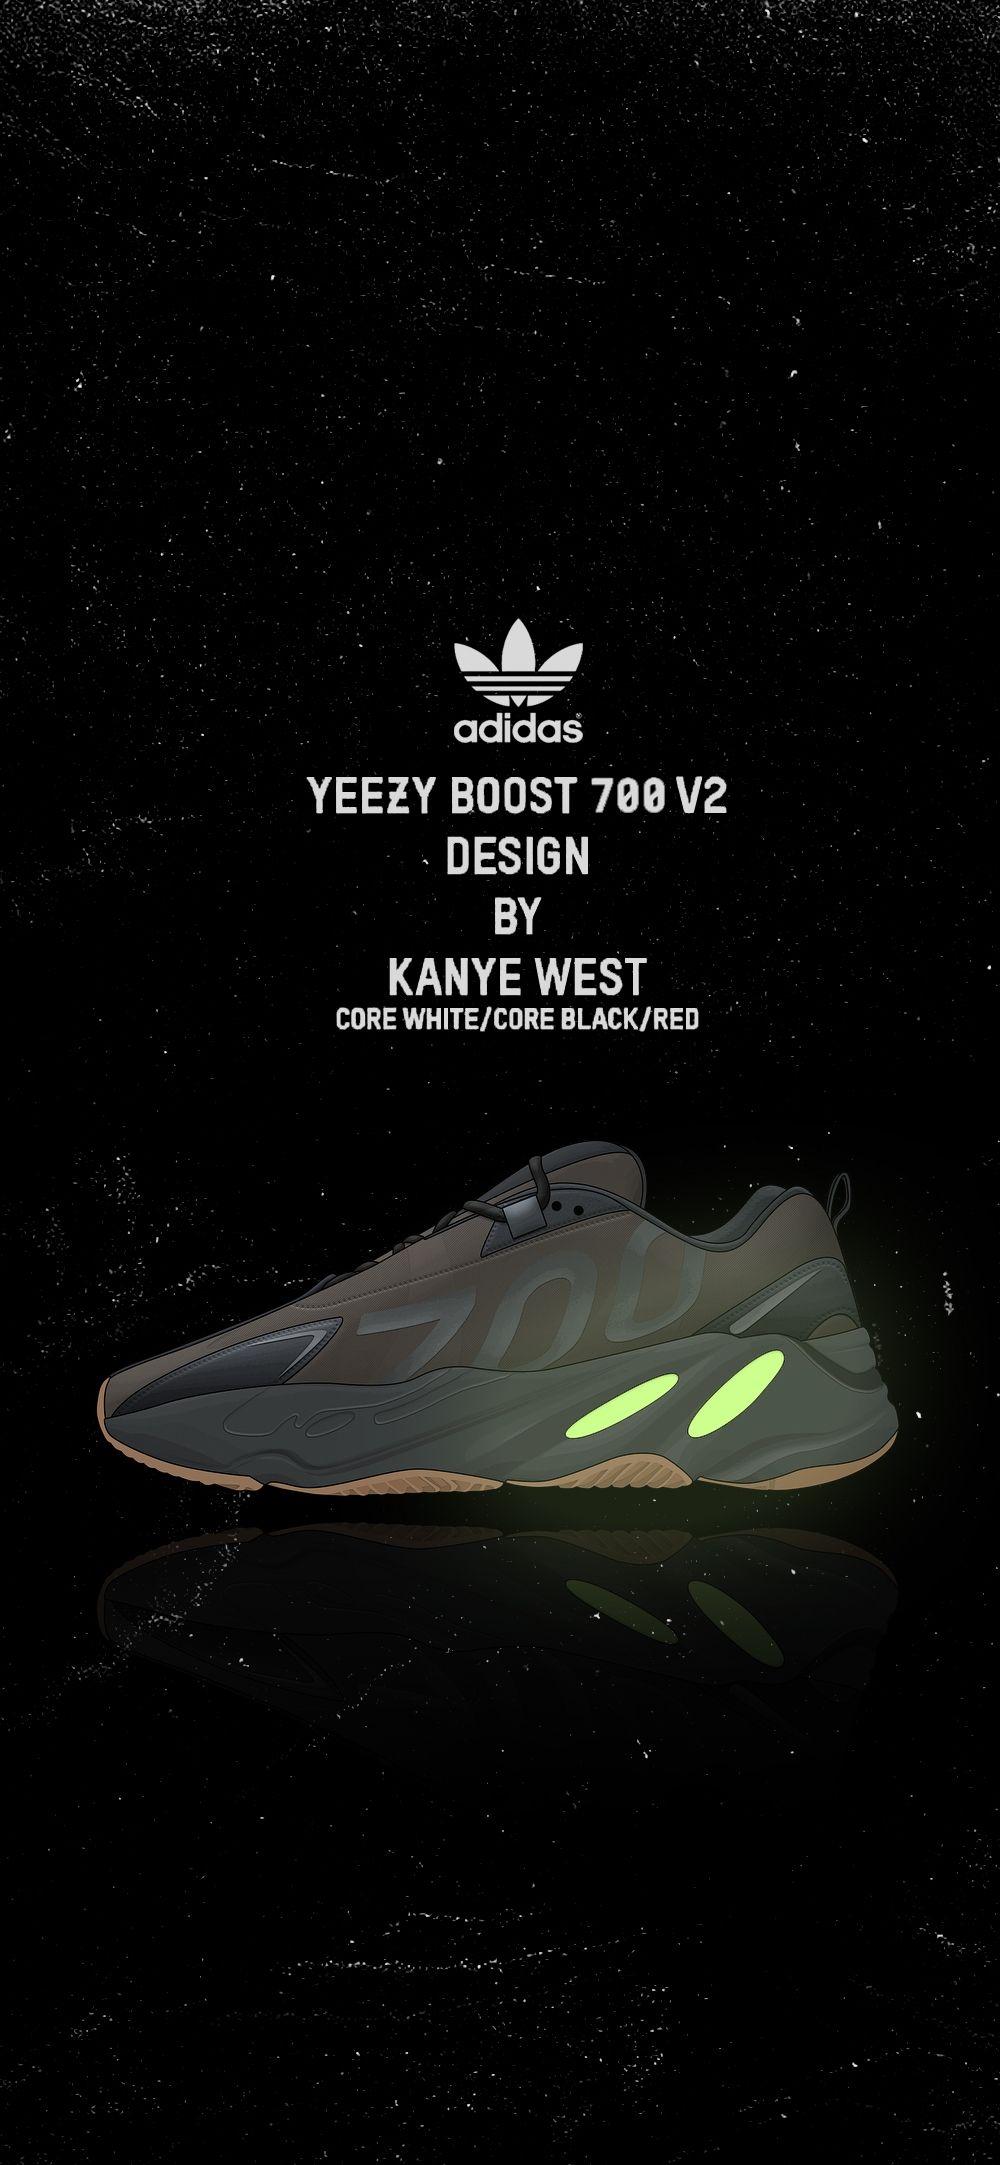 Yeezy Boost 700 Yeezy Black And Red Adidas Yeezy